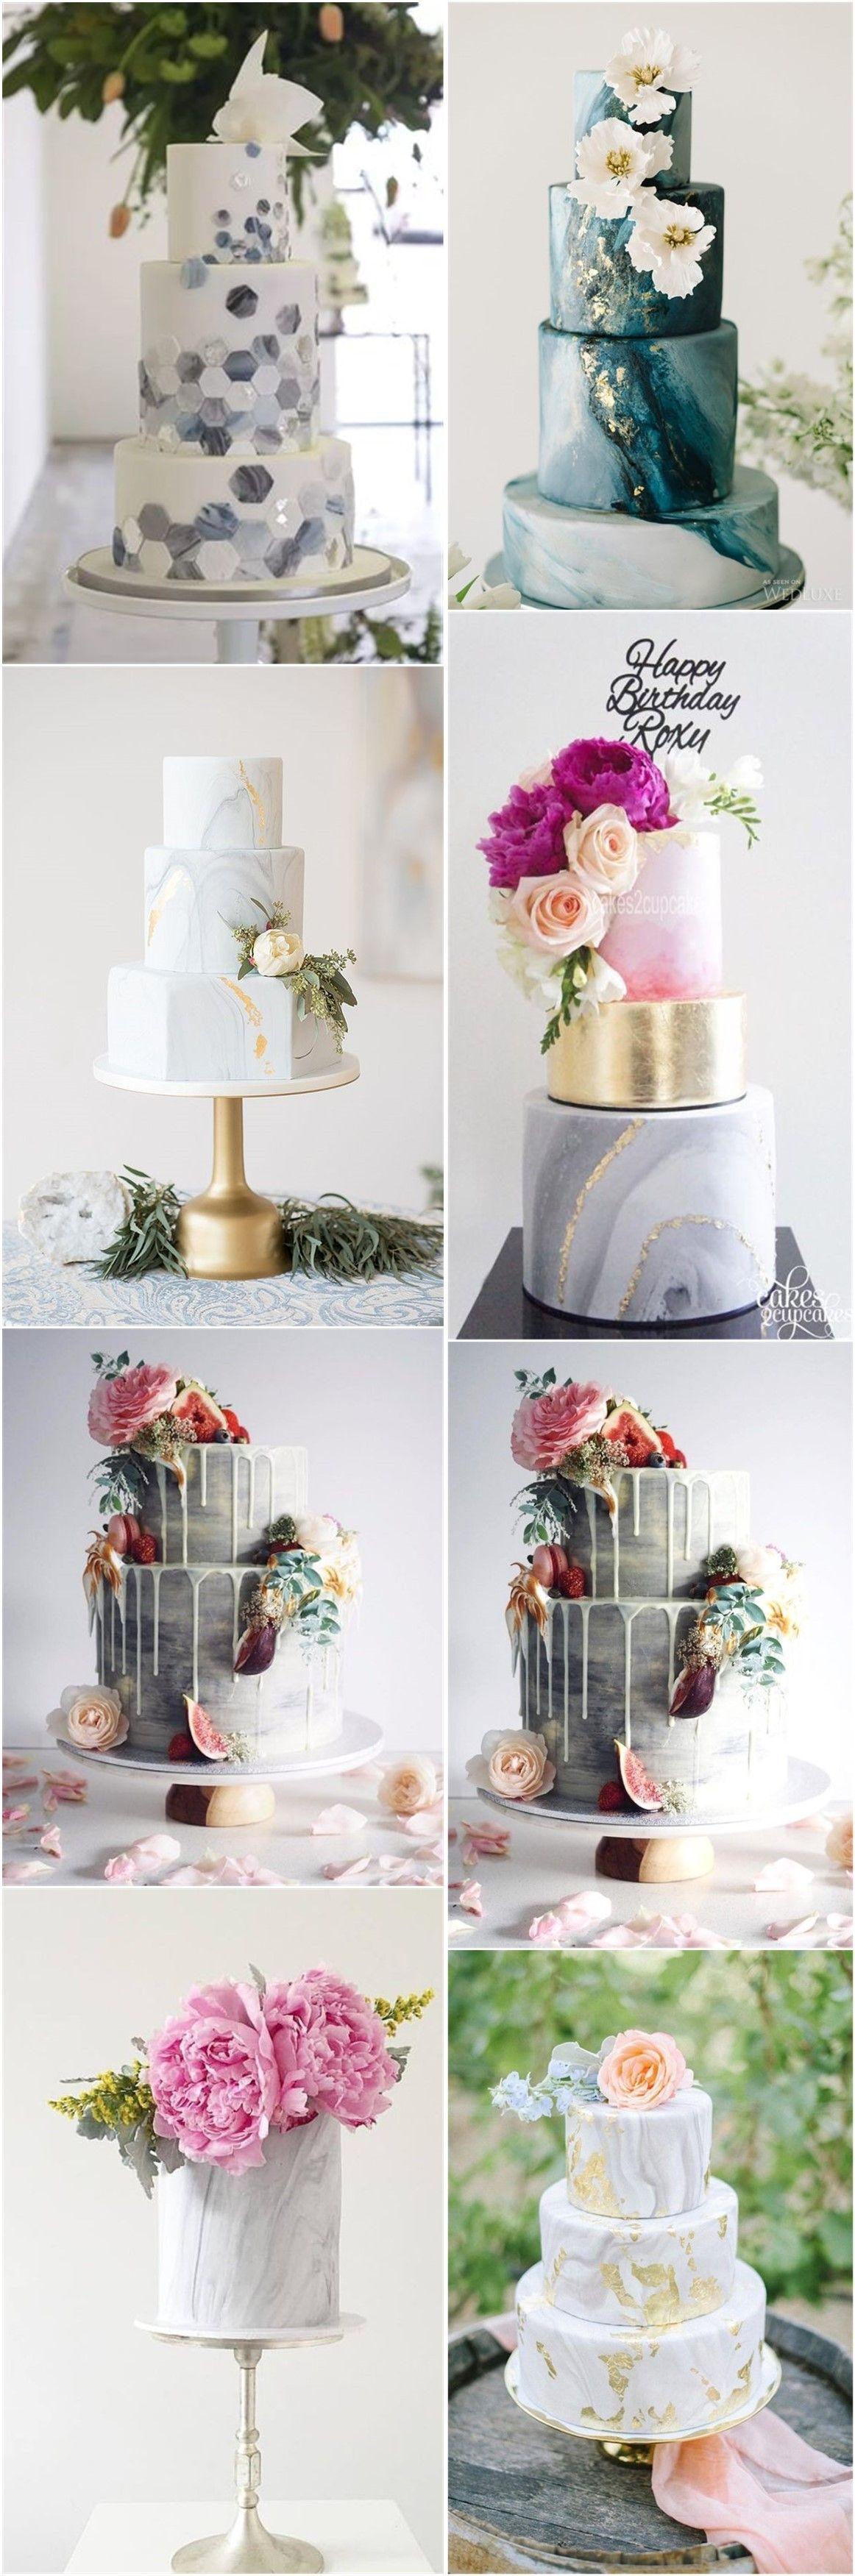 23 Unique Ideas for a Winter Wedding forecasting